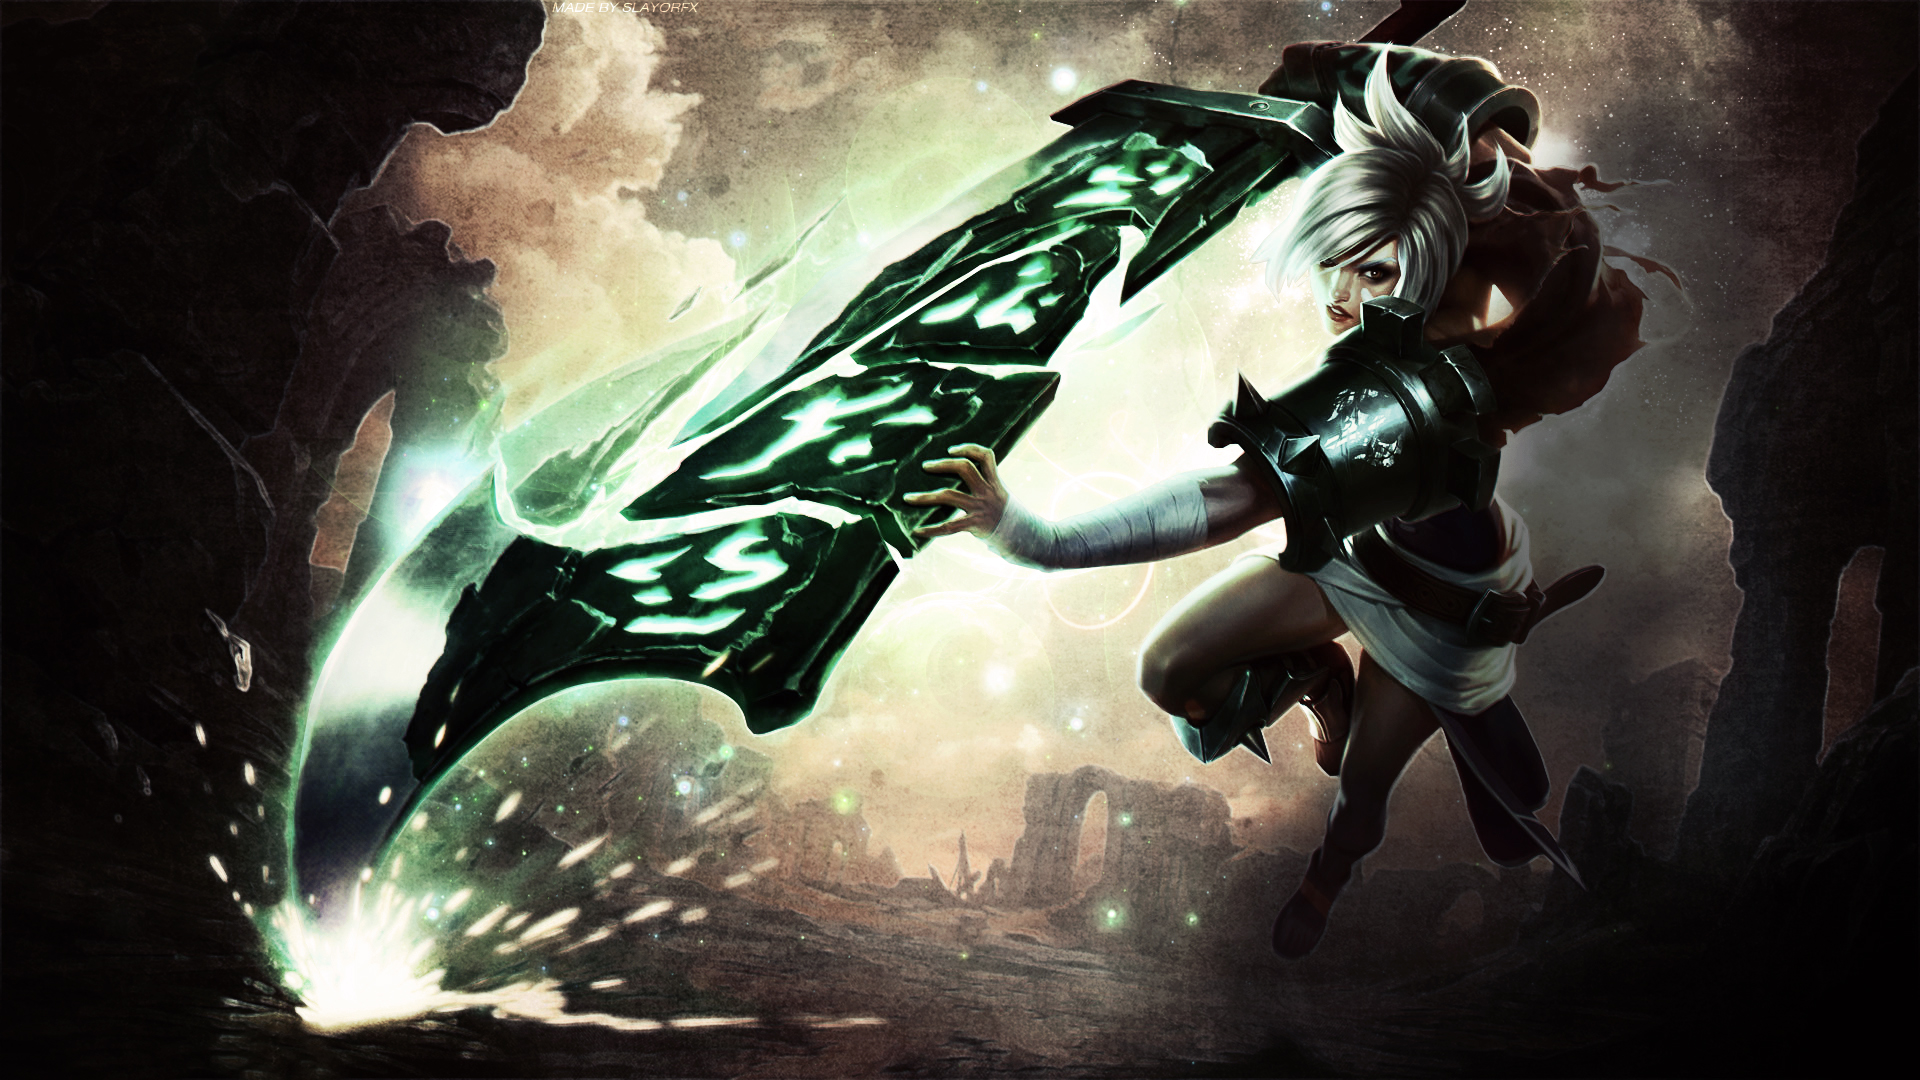 Free Download League Of Legends Wallpaper Riven League Of Legends